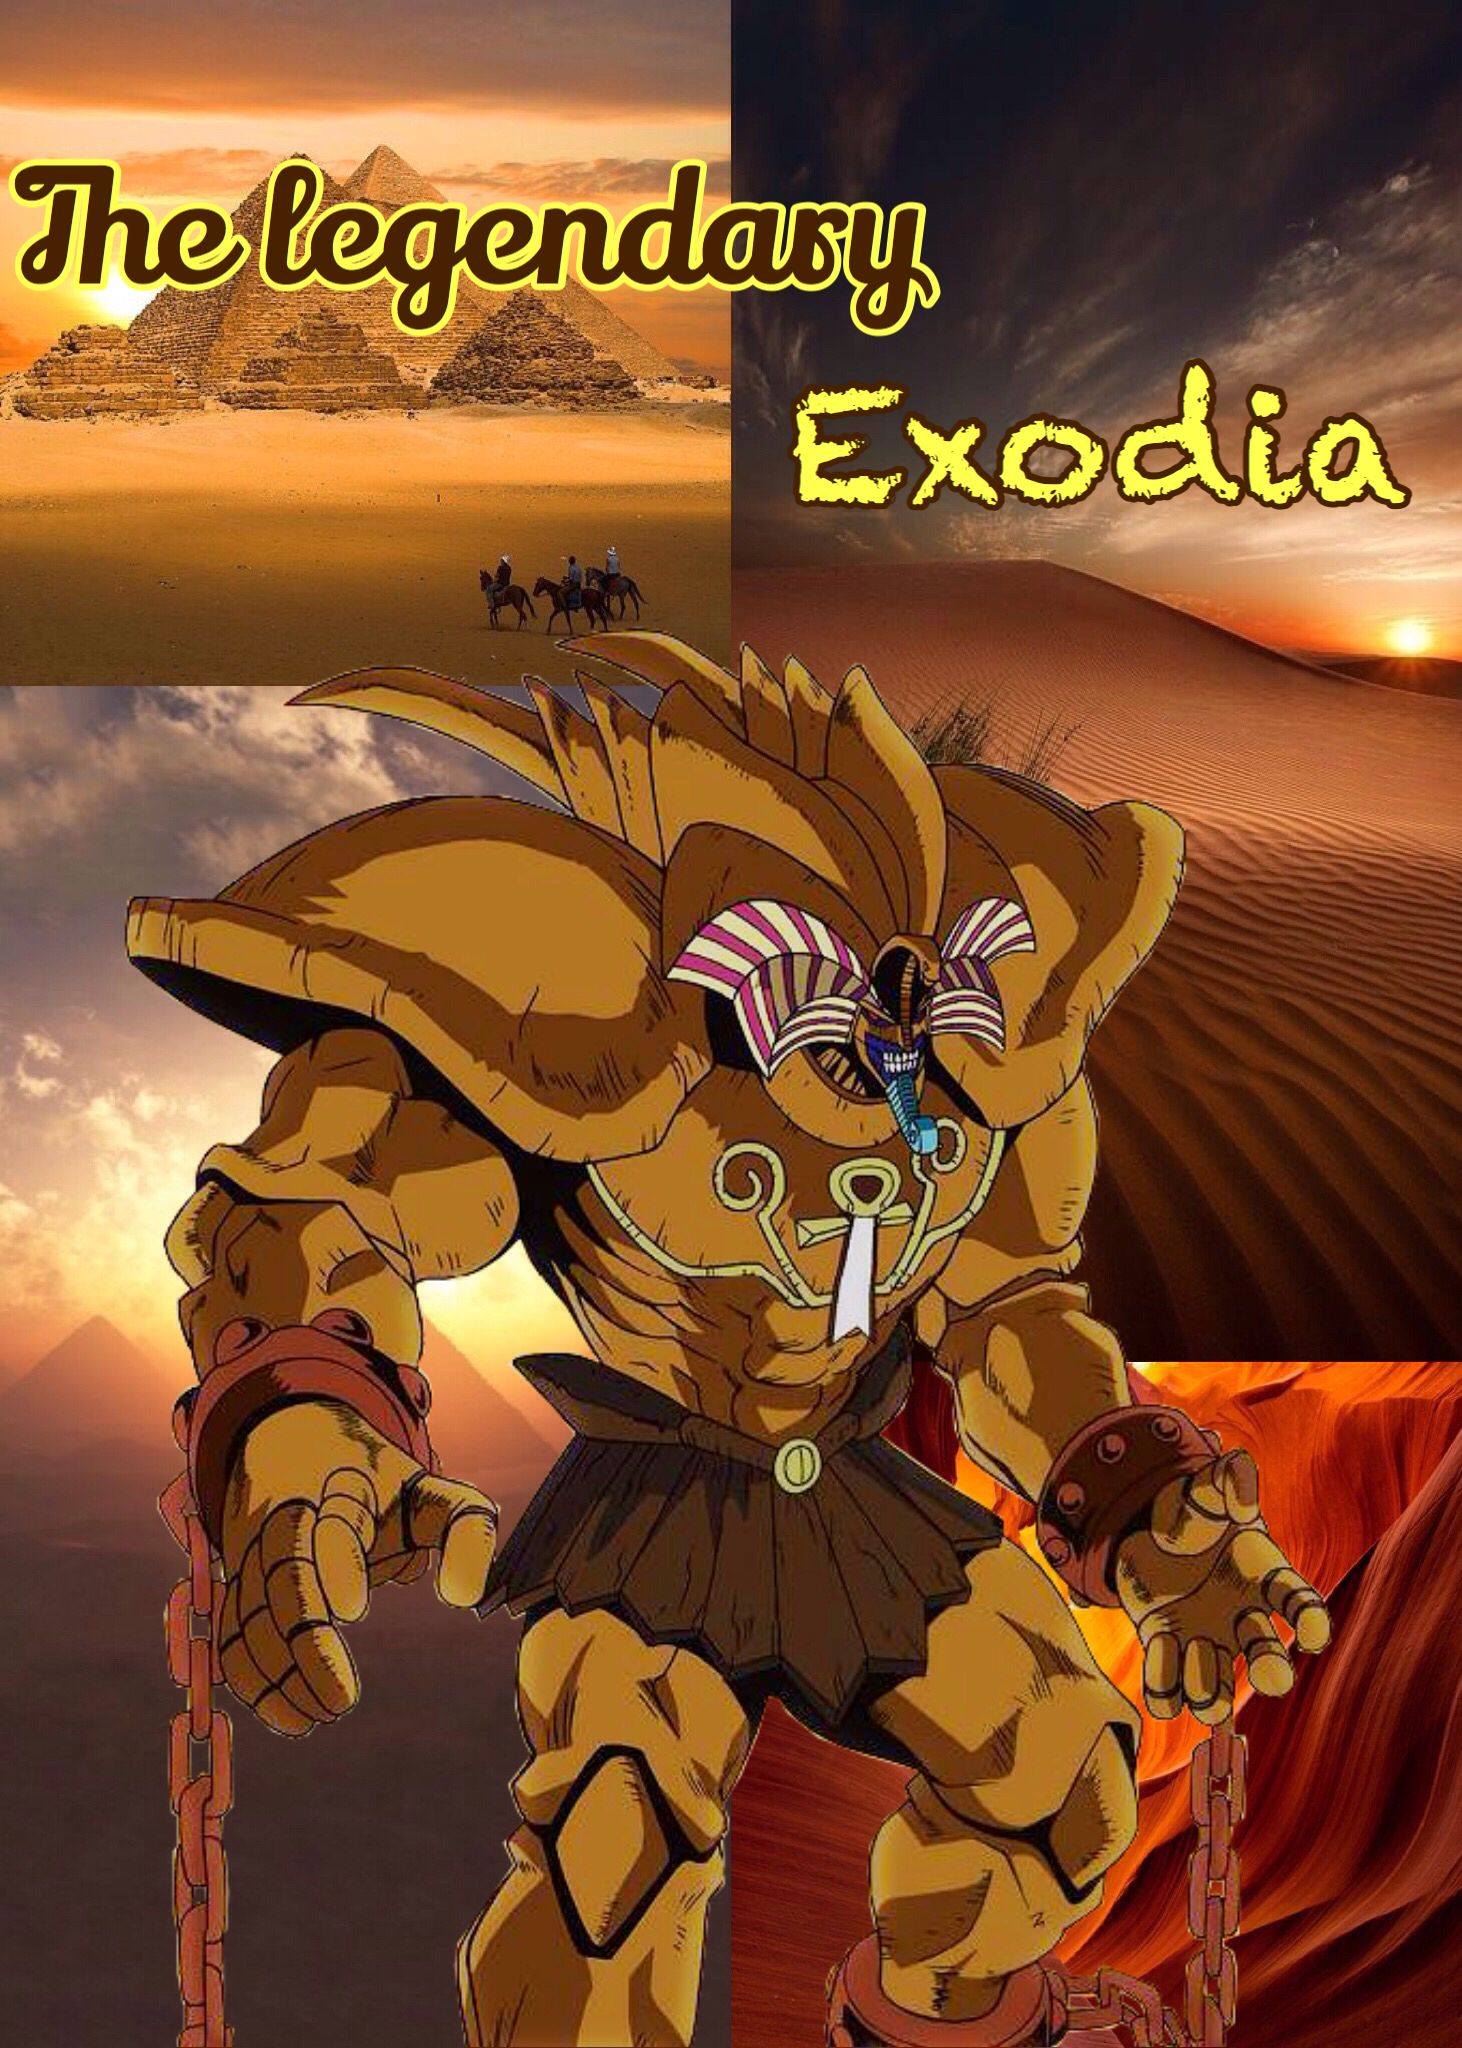 The Legendary Exodia Yu Gi Oh The Forbidden One Yugioh Manga Anime Anime